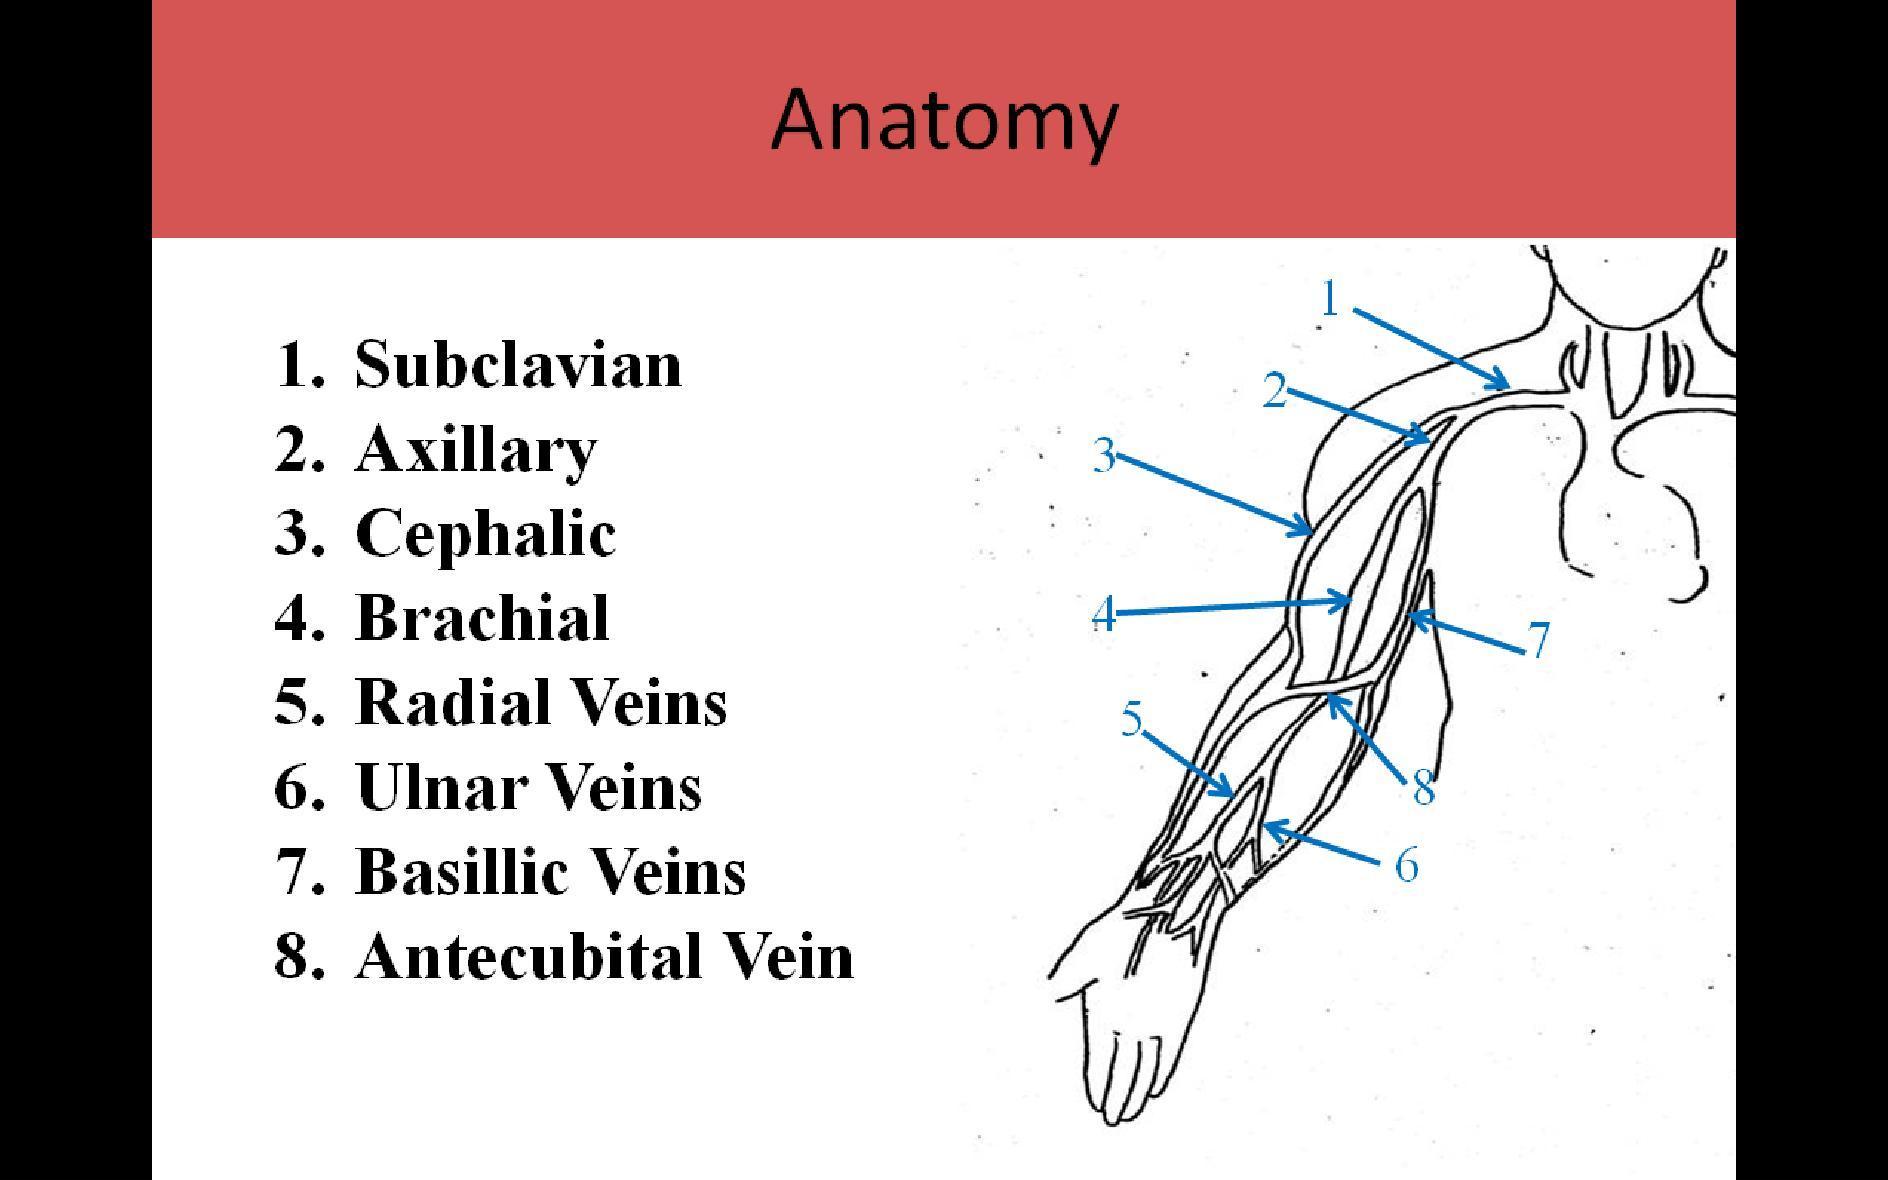 antecubital fossa diagram holden rodeo stereo wiring beste upper limb venous anatomy ideen menschliche